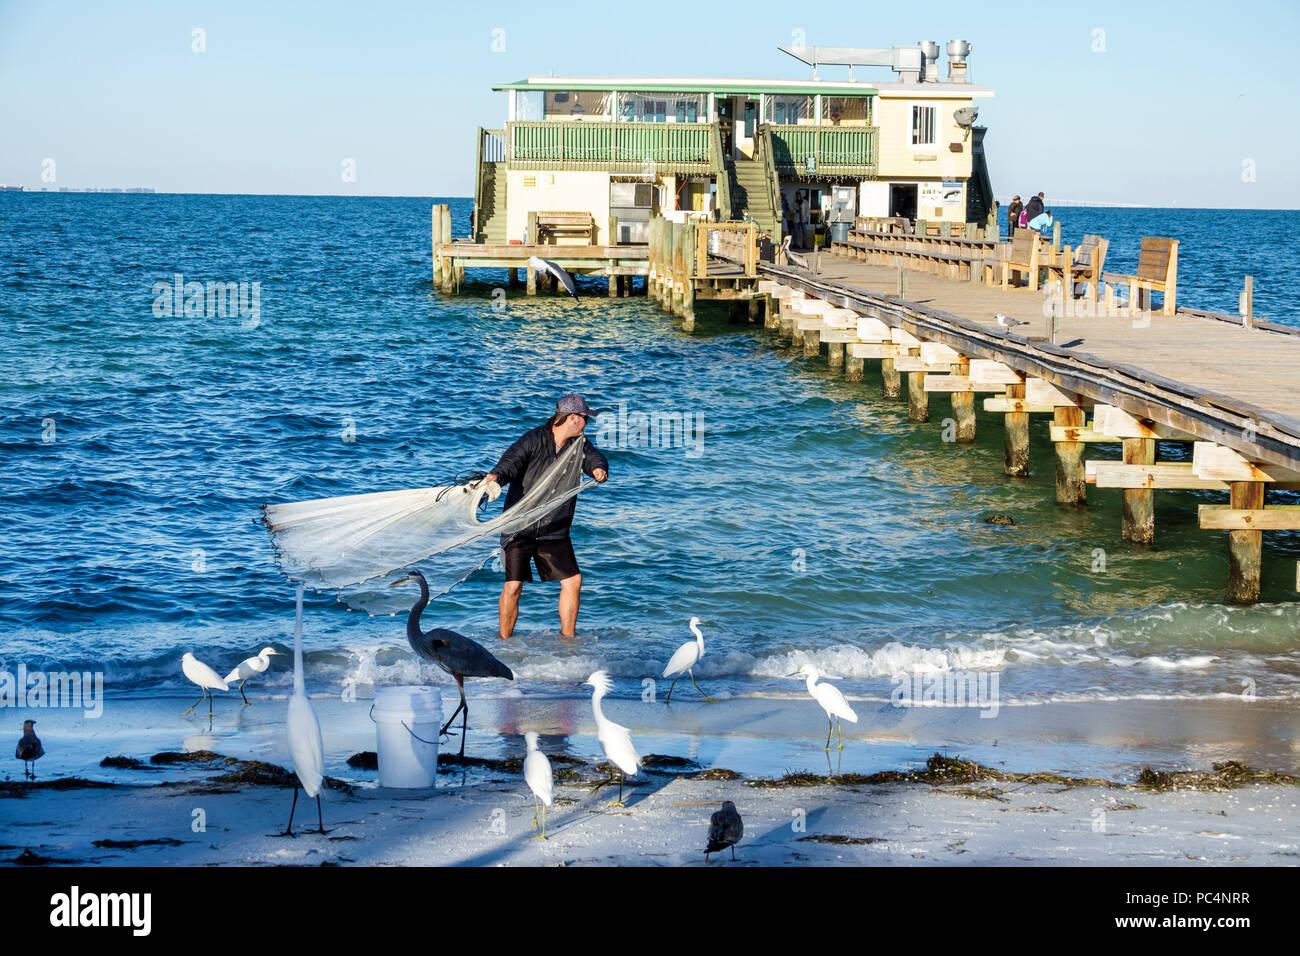 Florida Anna Maria Island Anna Maria City Pier Rod & Reel restaurant wooden pier man casting net fishing water birds egret heron - Stock Image